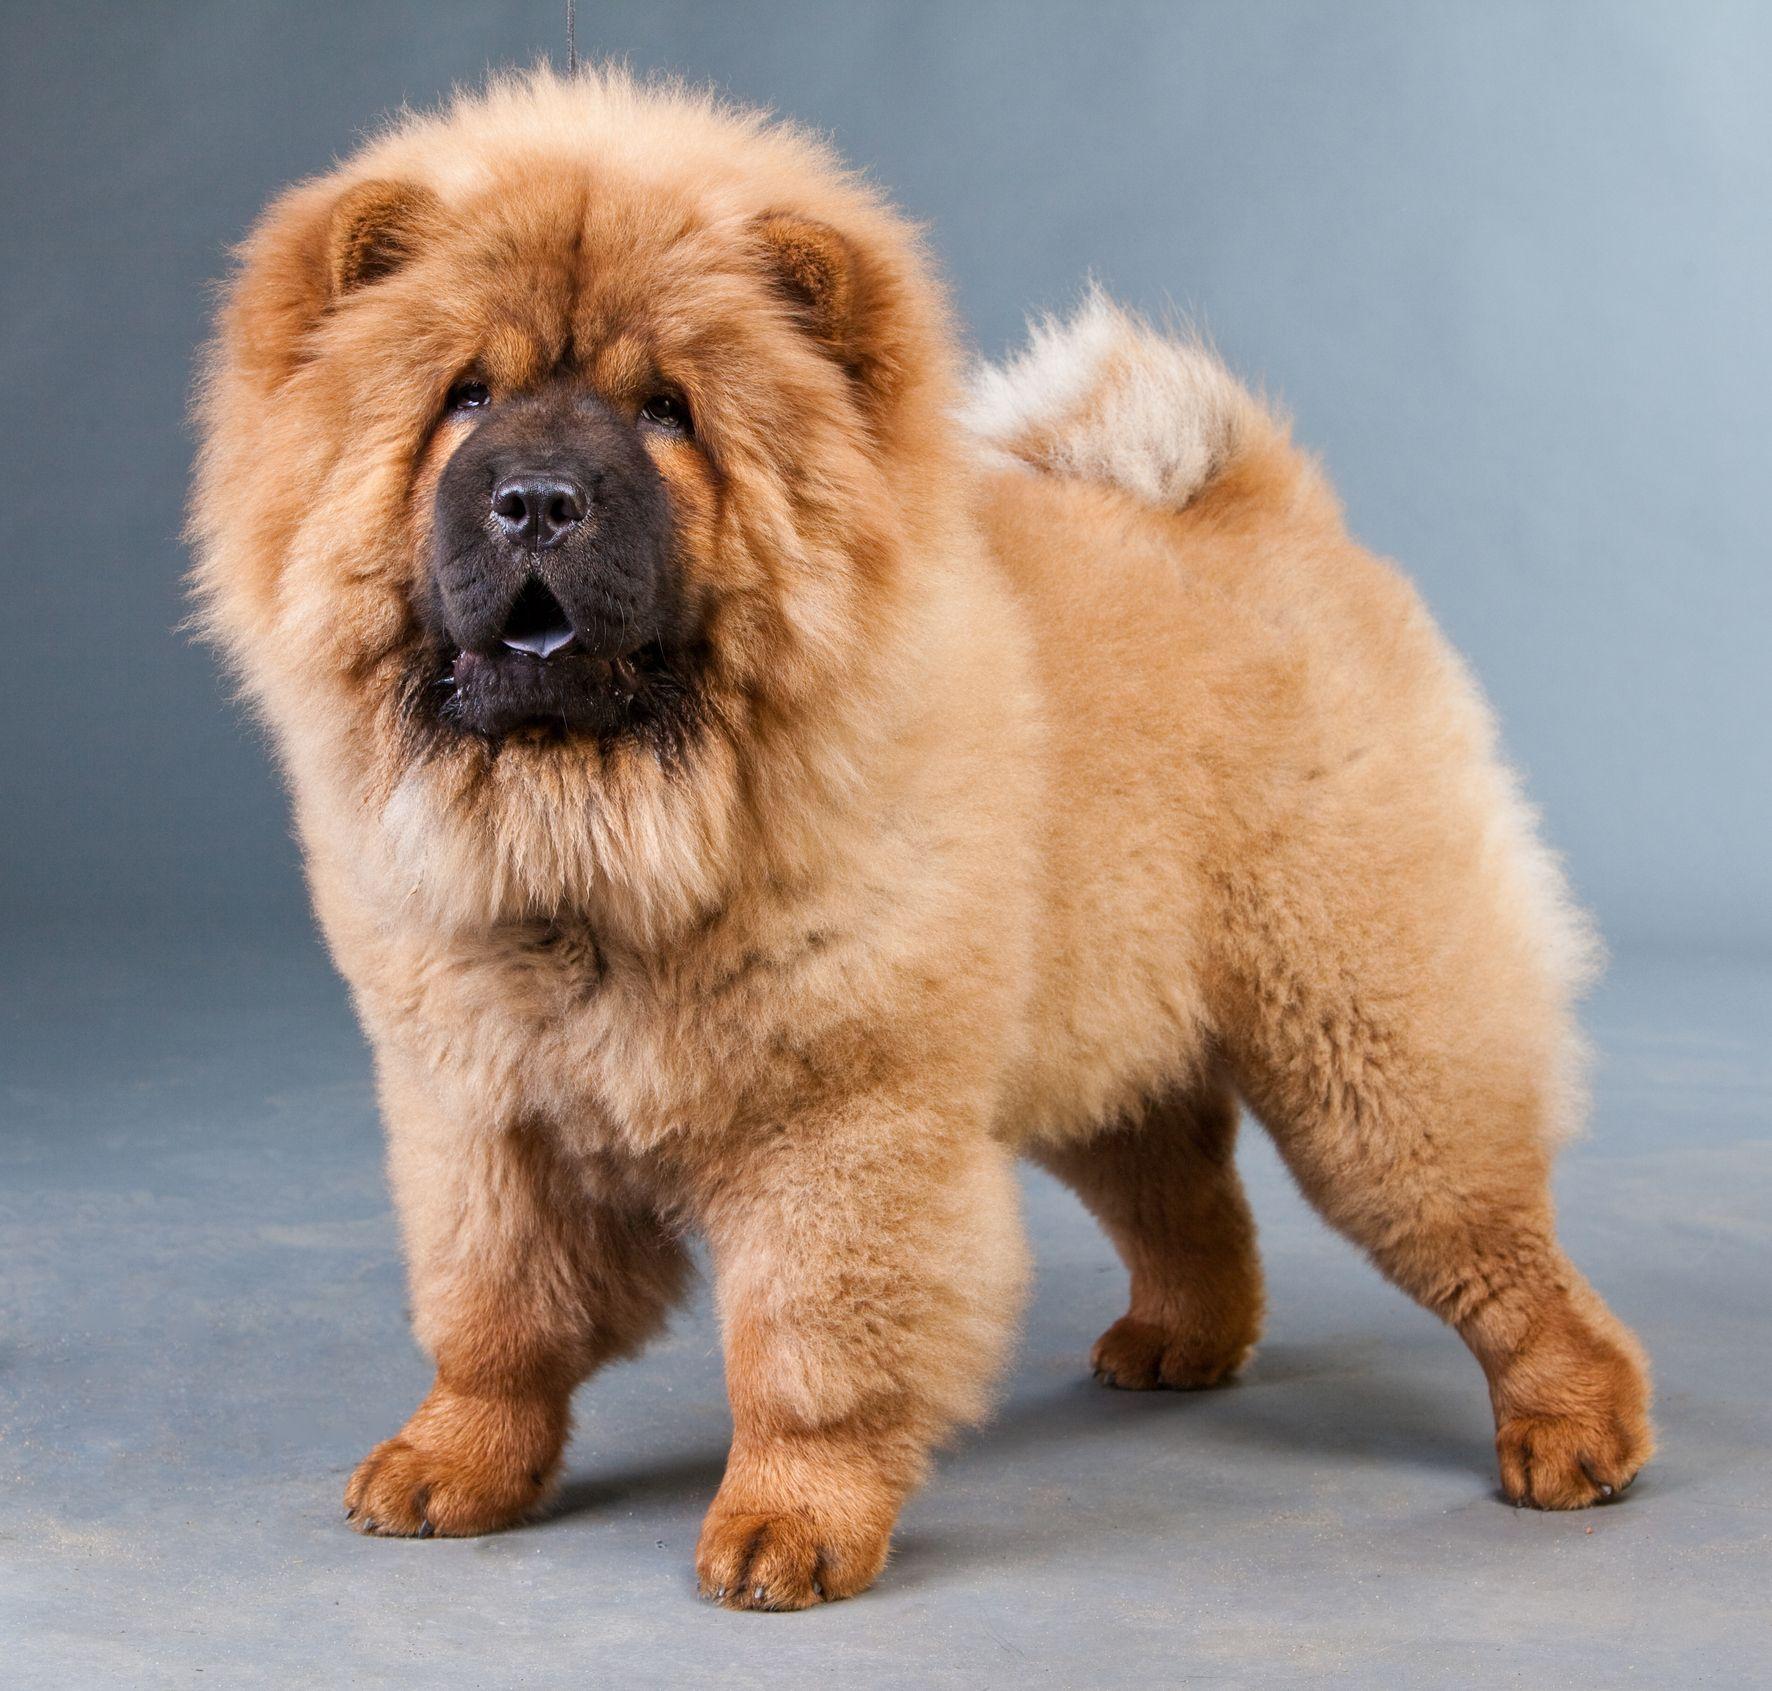 8 Dogs That Look Like Bears: Chow Chow